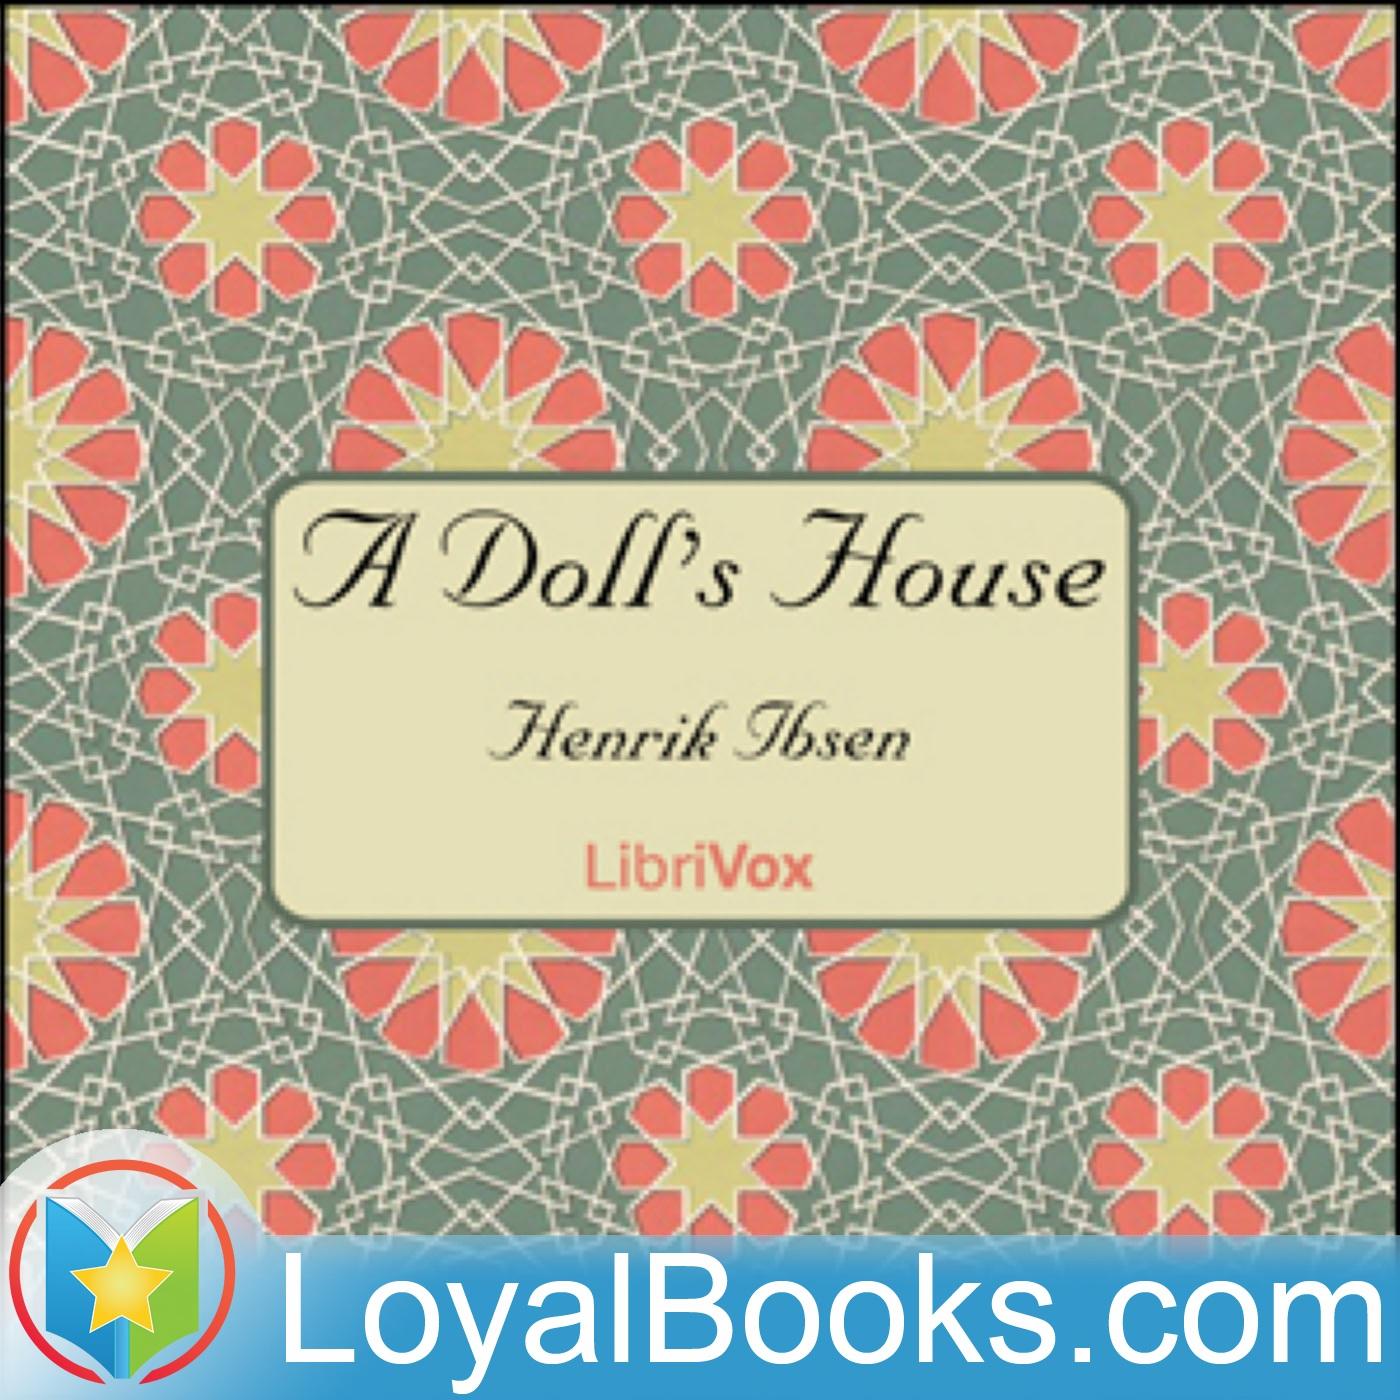 <![CDATA[A Doll's House by Henrik Ibsen]]>